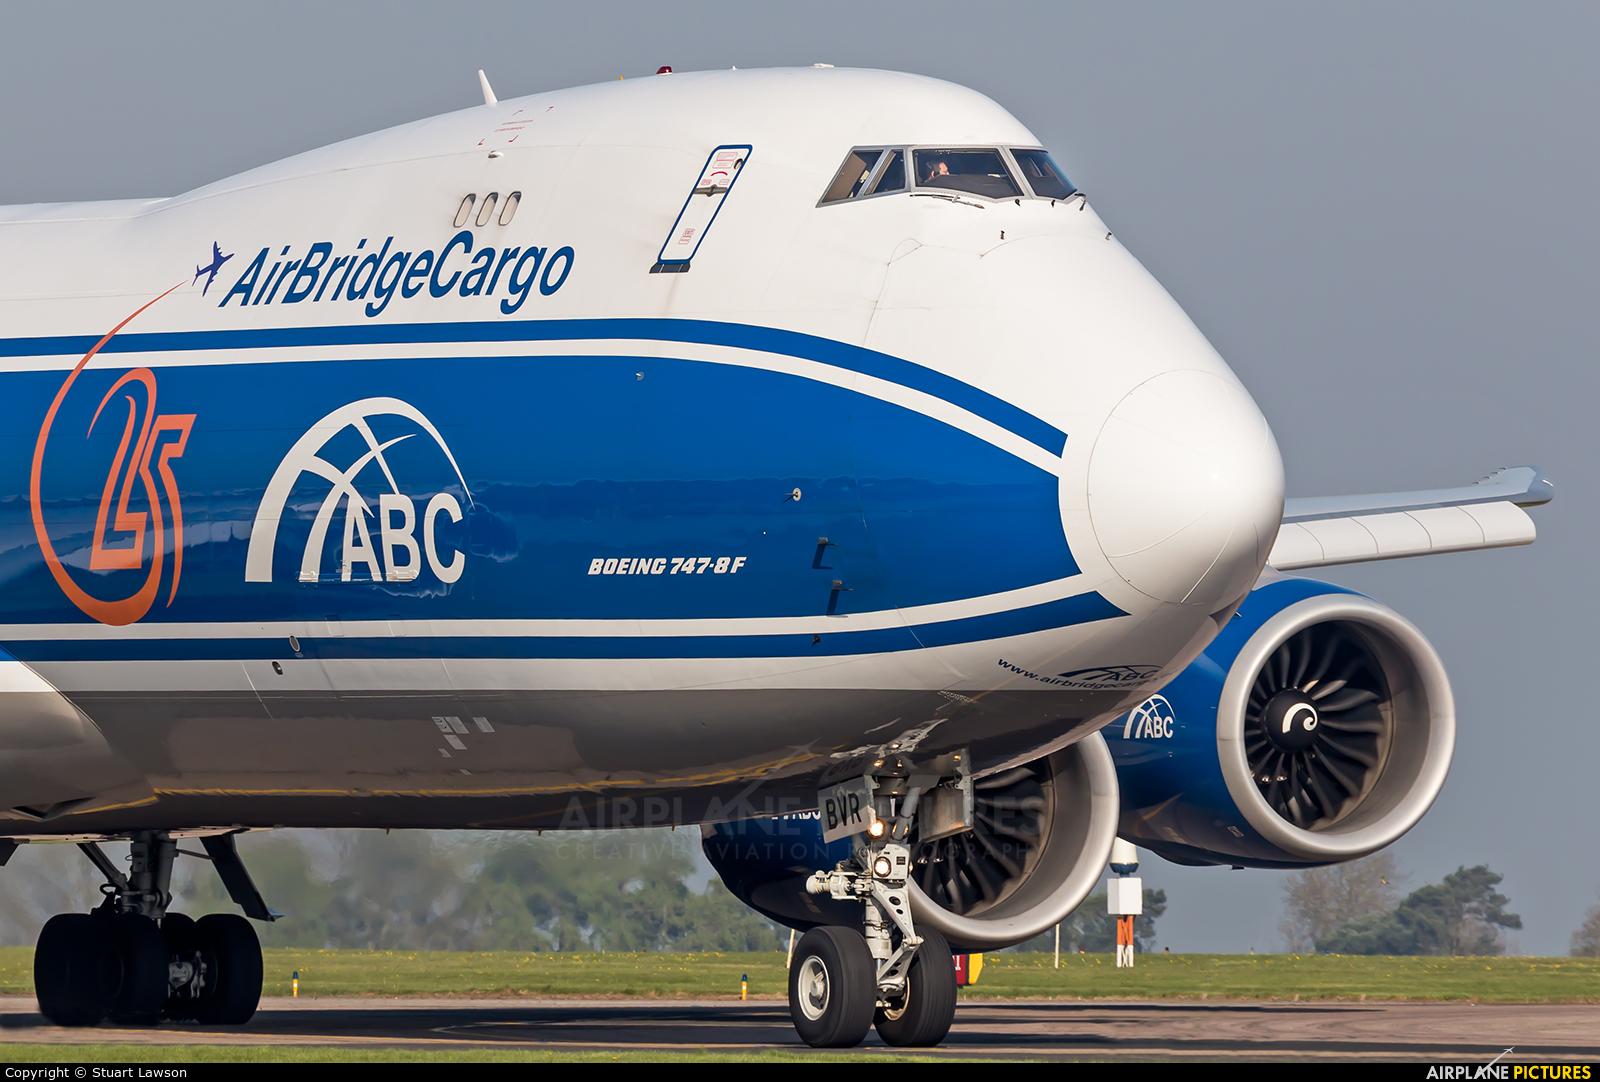 Air Bridge Cargo VQ-BVR aircraft at East Midlands